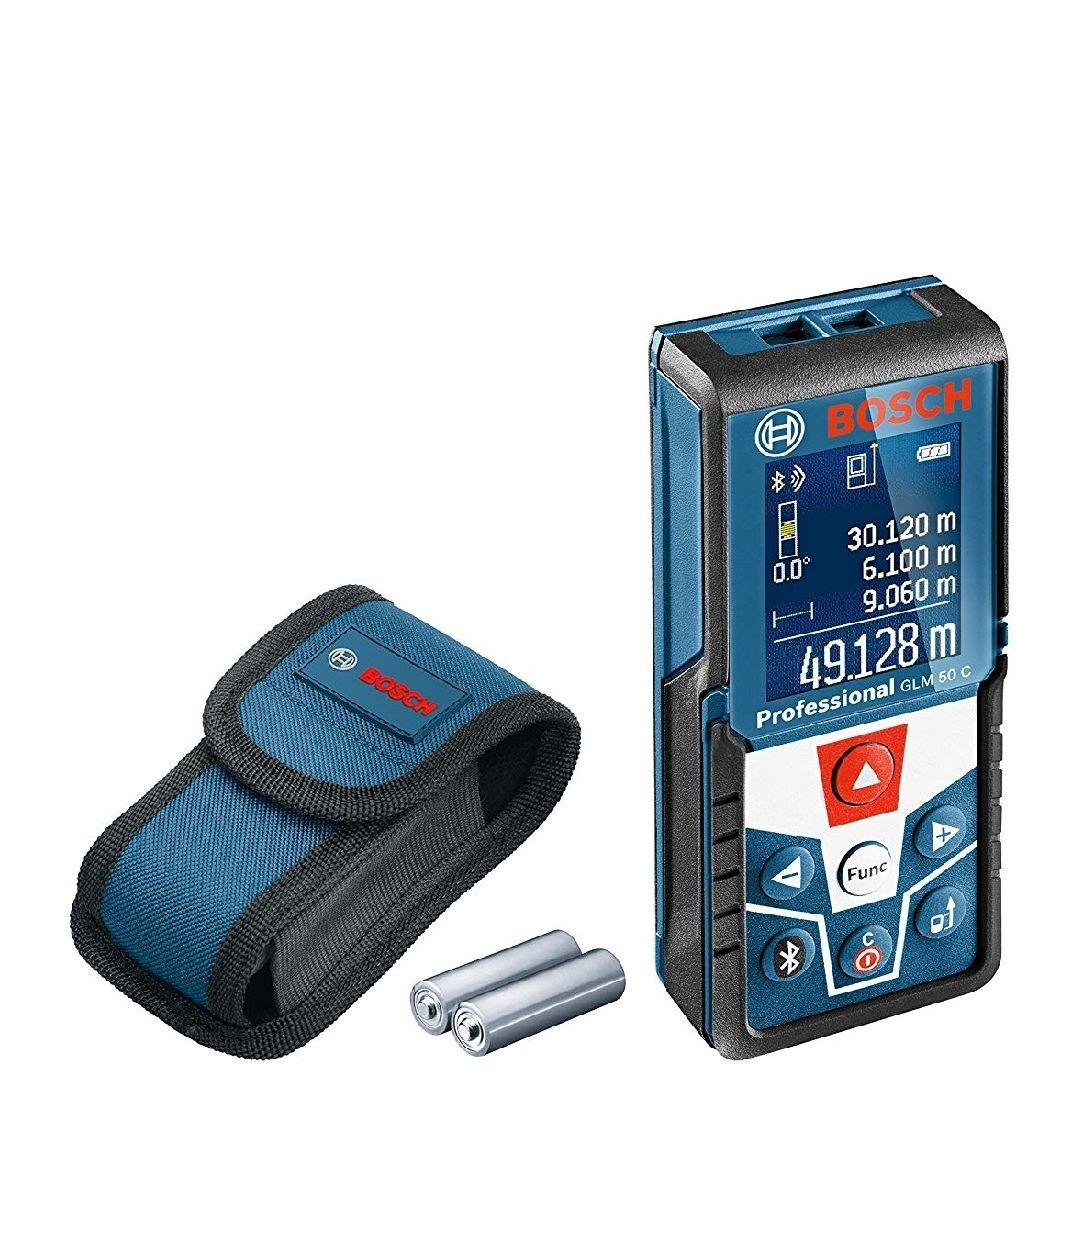 Bosch Professional 0601072C00 Bosch 50 C Professional Laser Measure with GLM Floorplan App £72.99 at Amazon